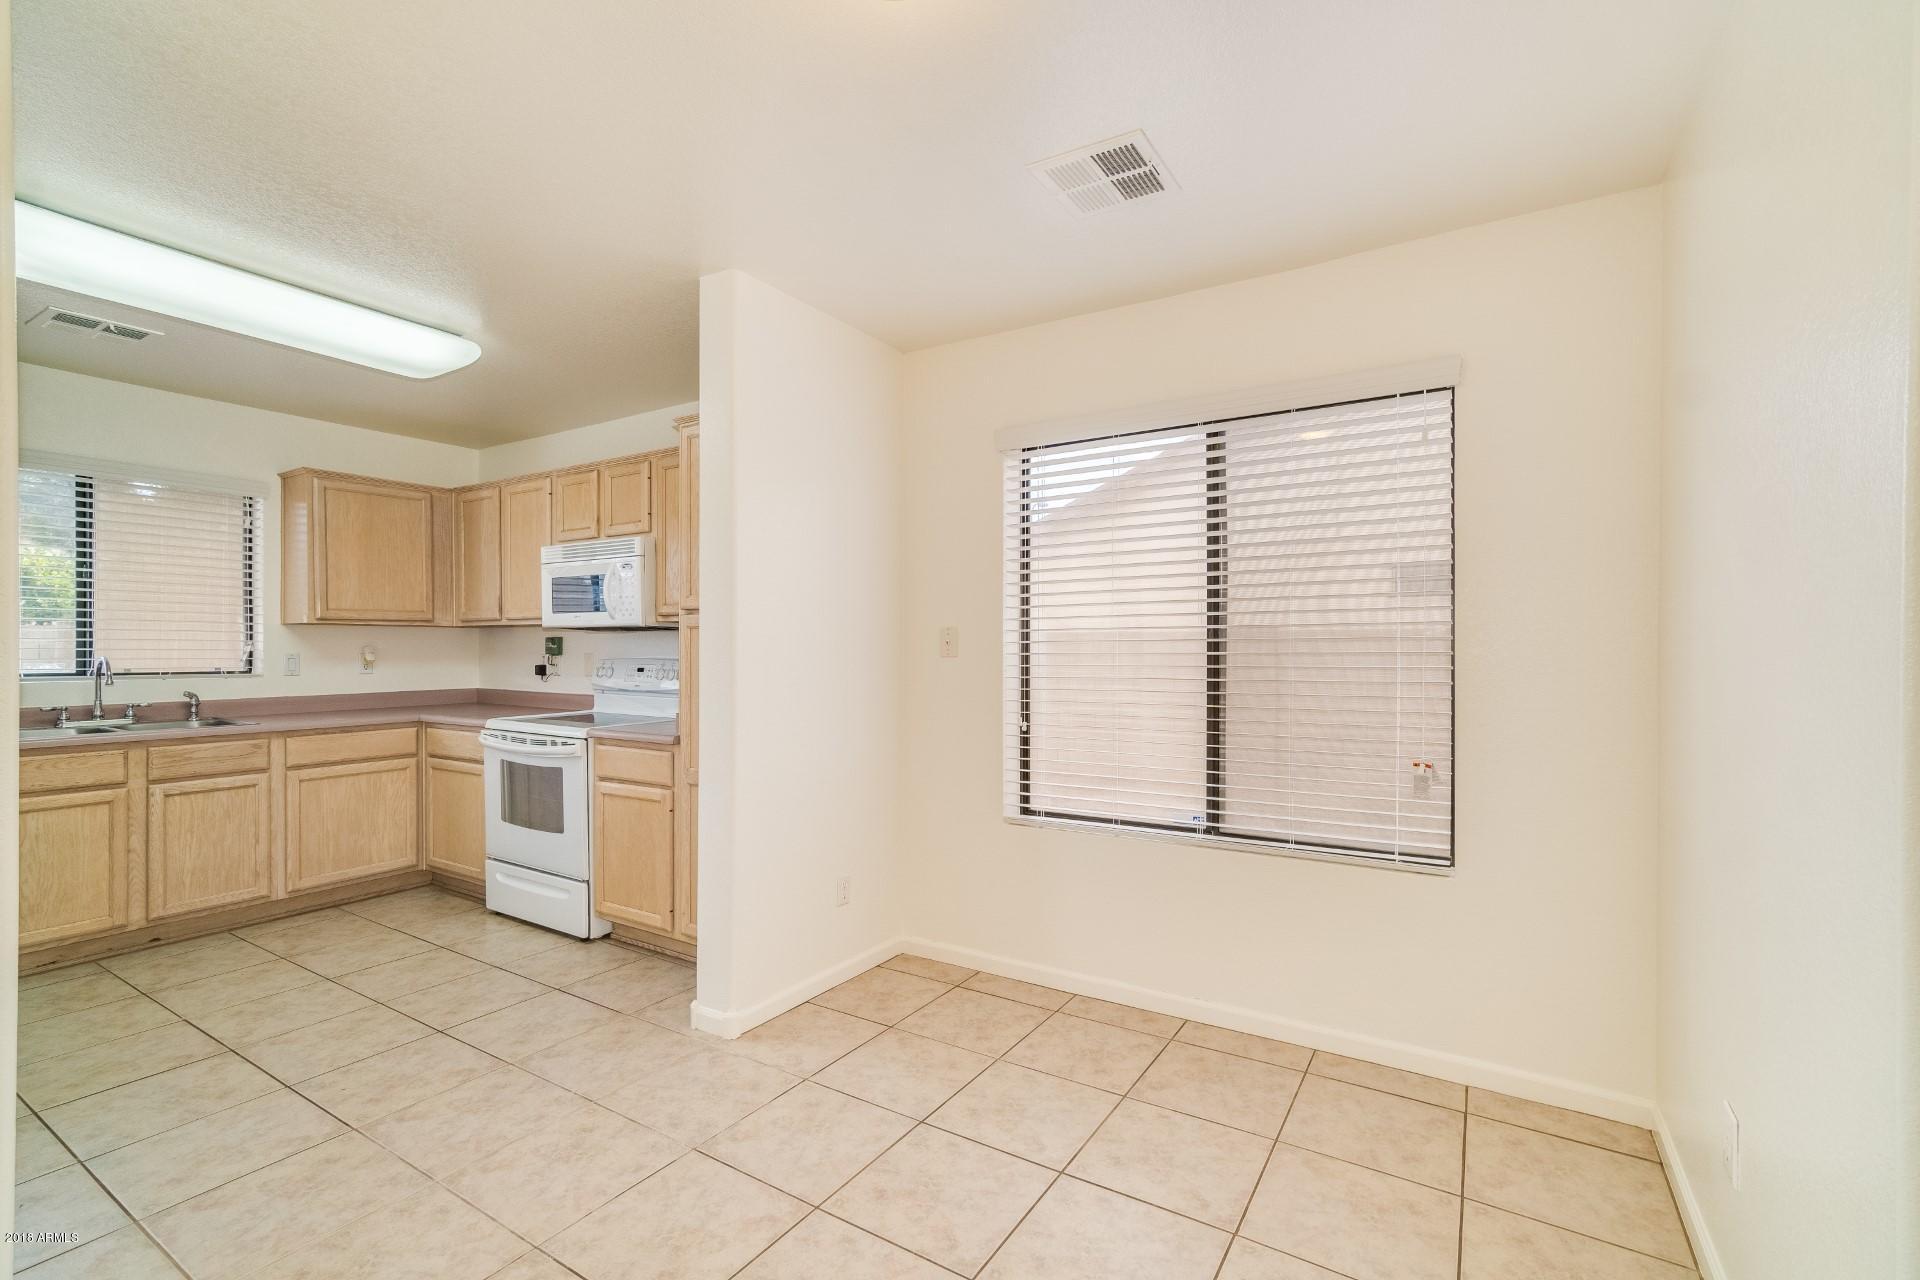 8021 W SIERRA VISTA Drive Glendale, AZ 85303 - MLS #: 5855775